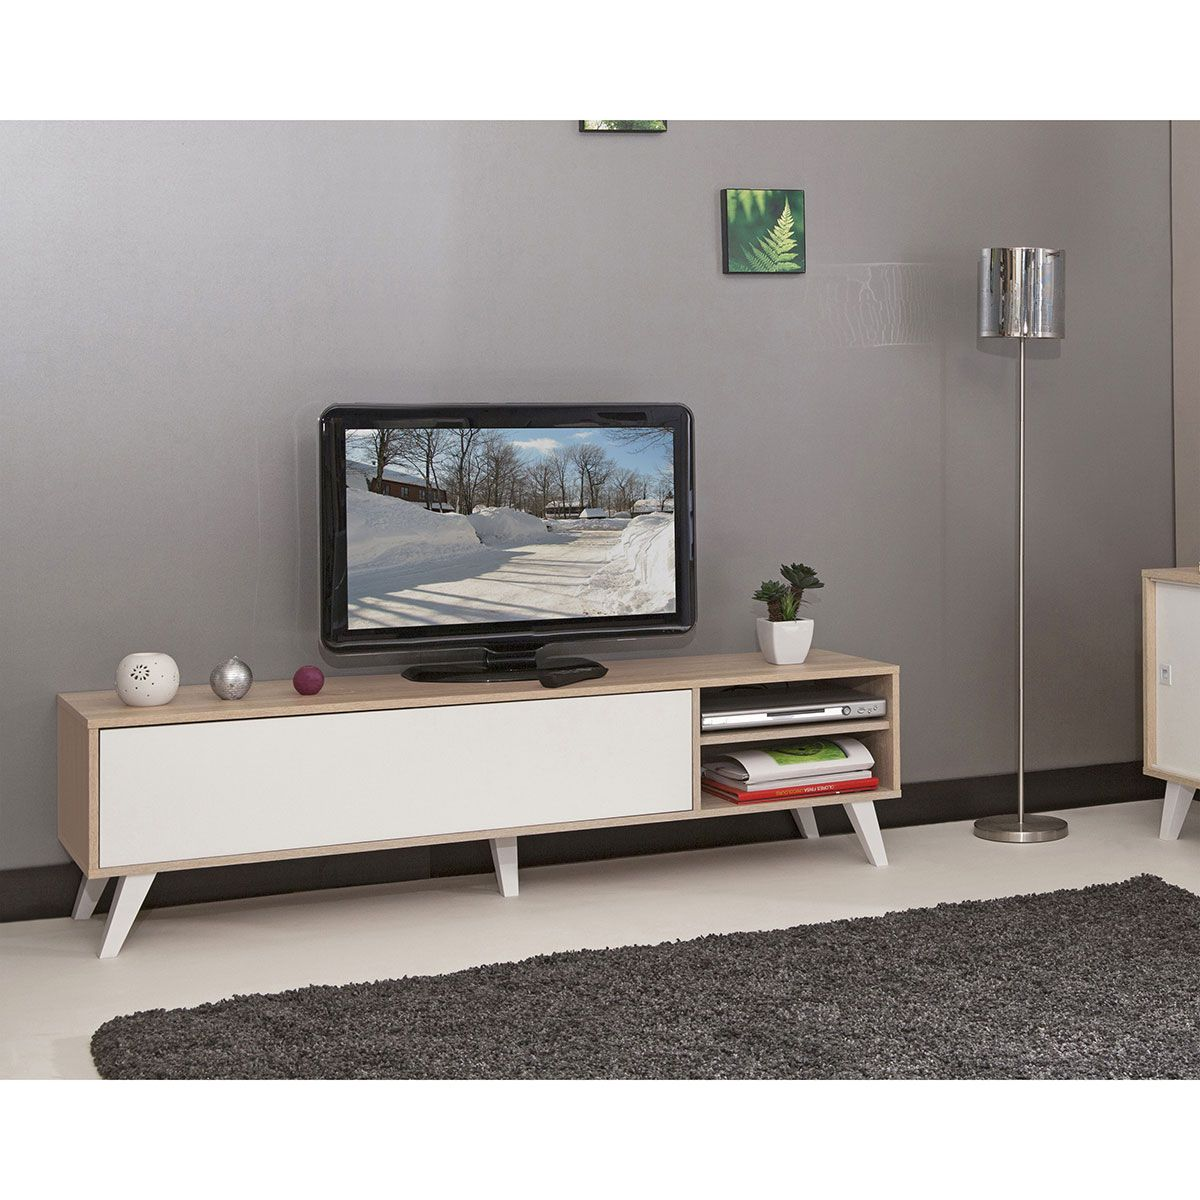 Meuble Tv Pieds Inclin S 165 Cm Ch Ne Blanc Chene Blanc Meuble  # Meuble Blanc Et Chene